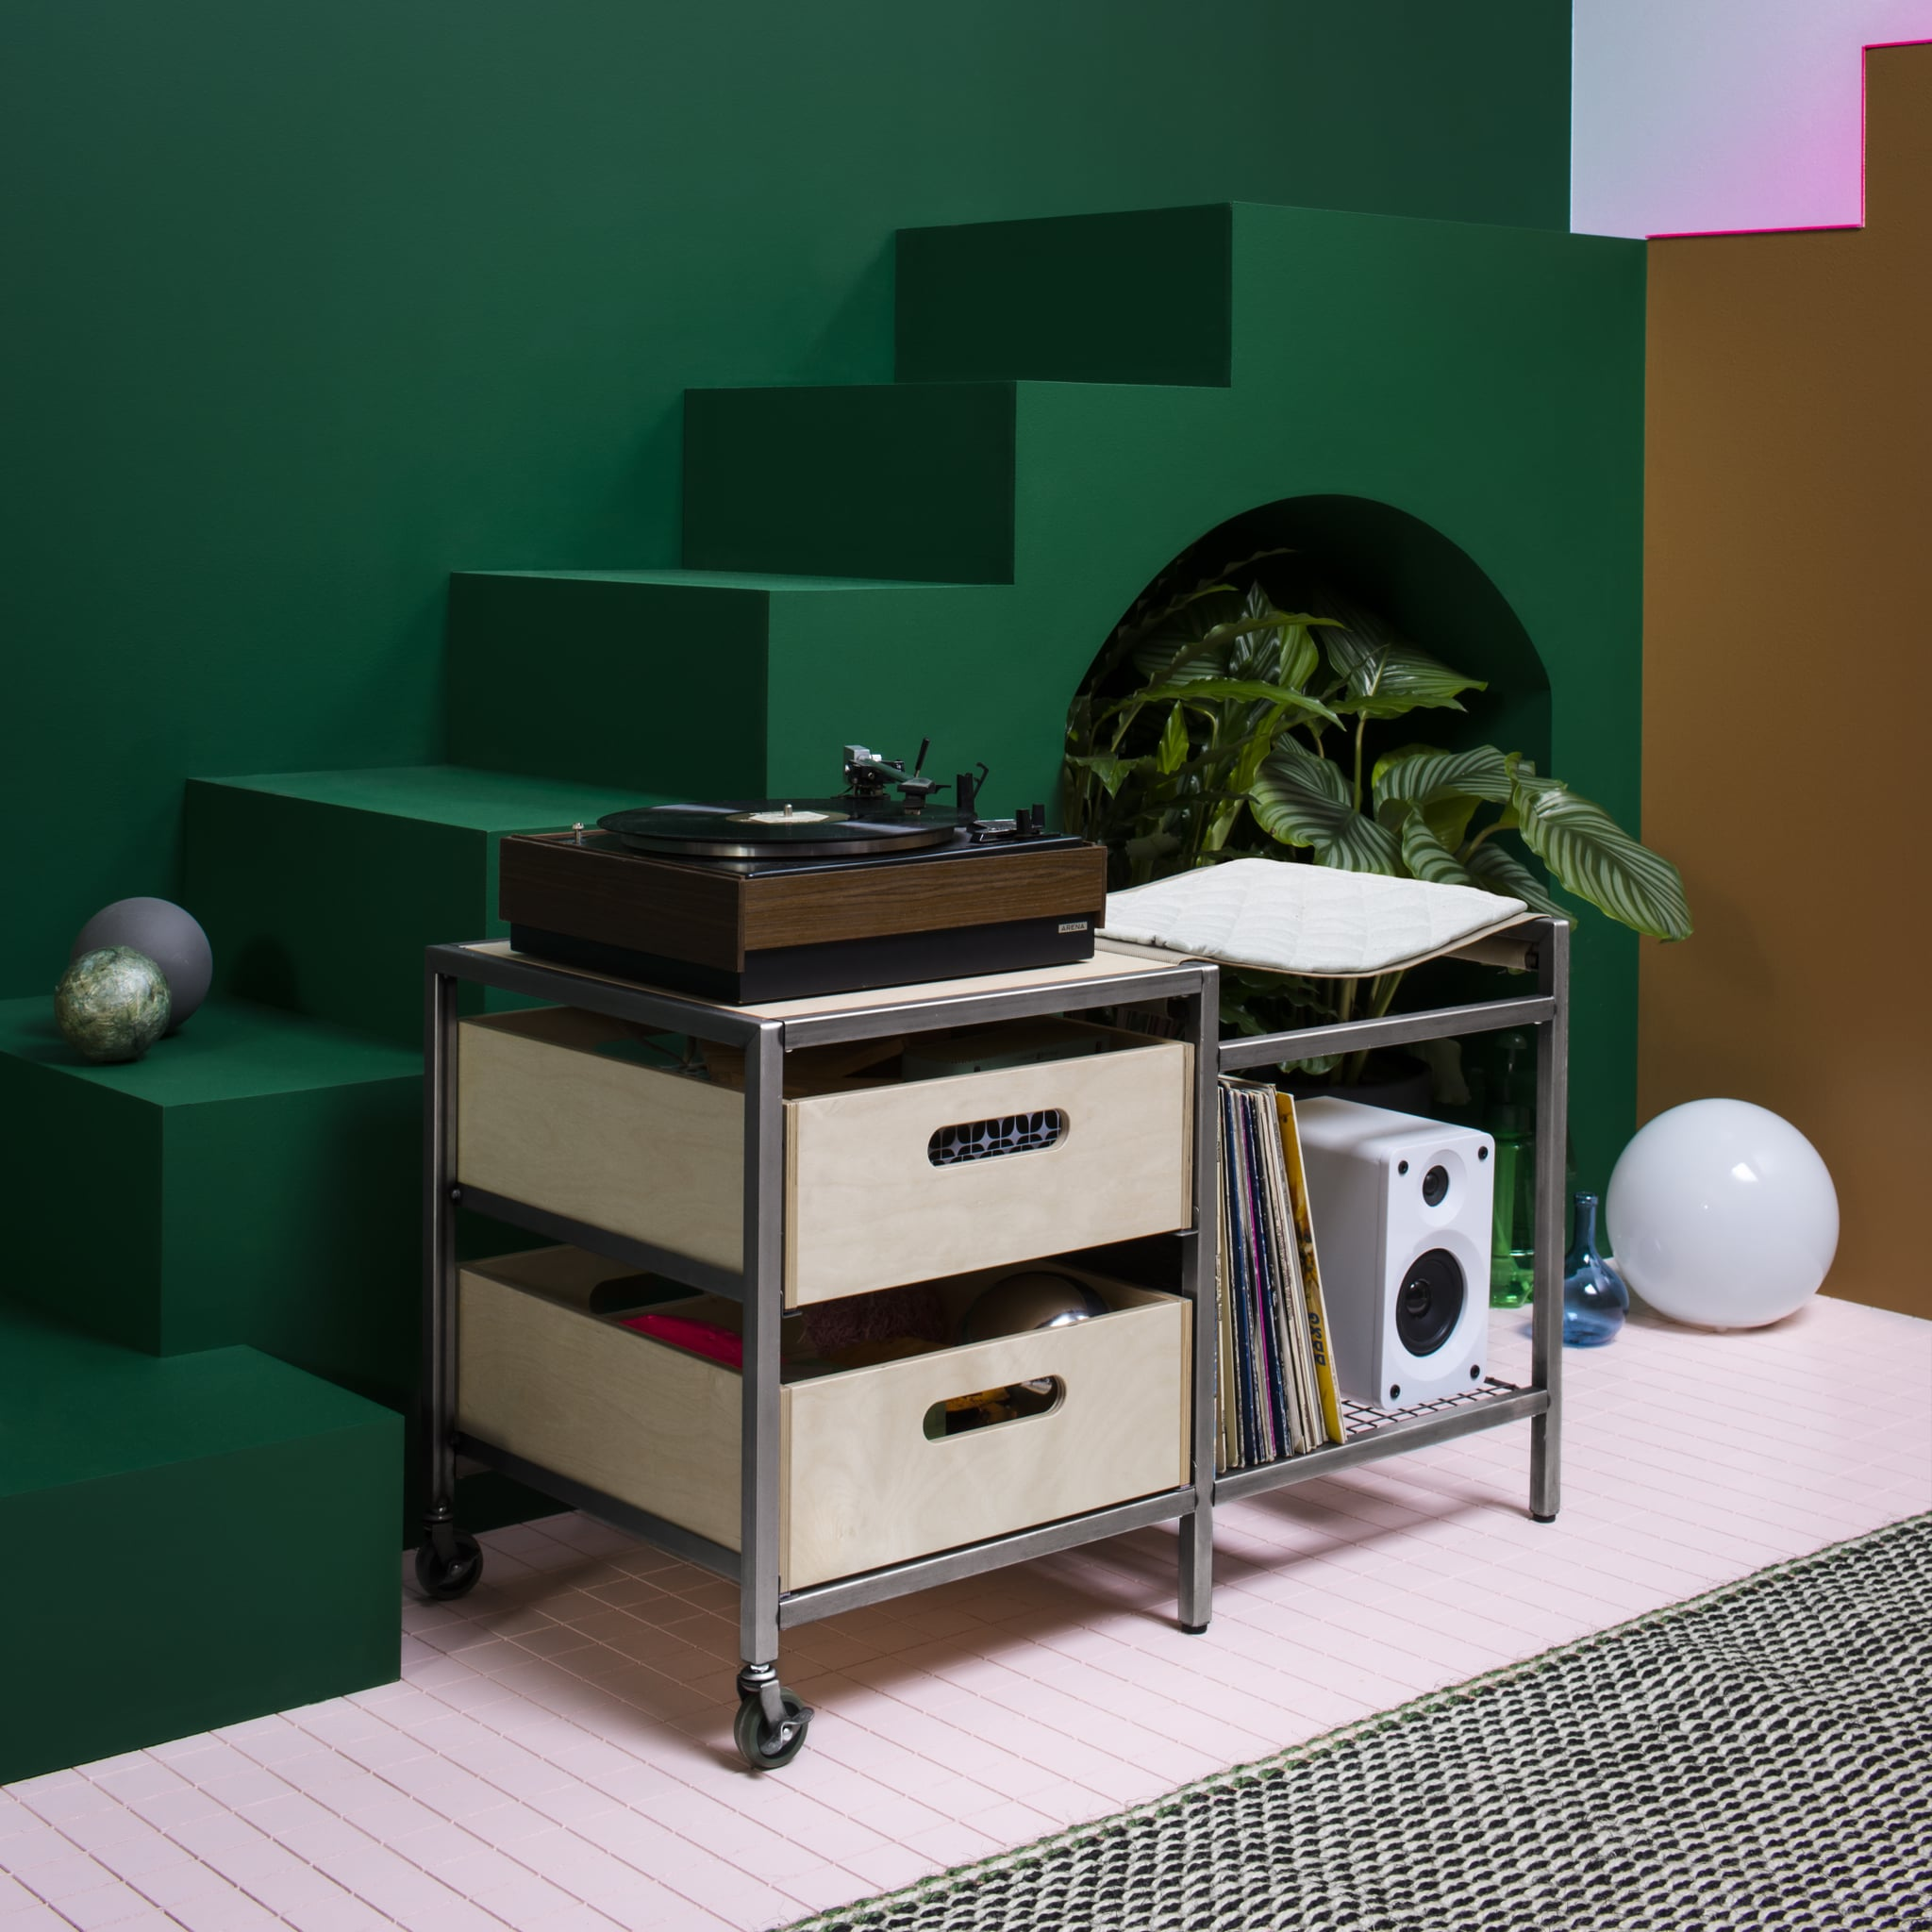 Veberöd Bench ($100) | Organizing Your Small Apartment Has Never ...